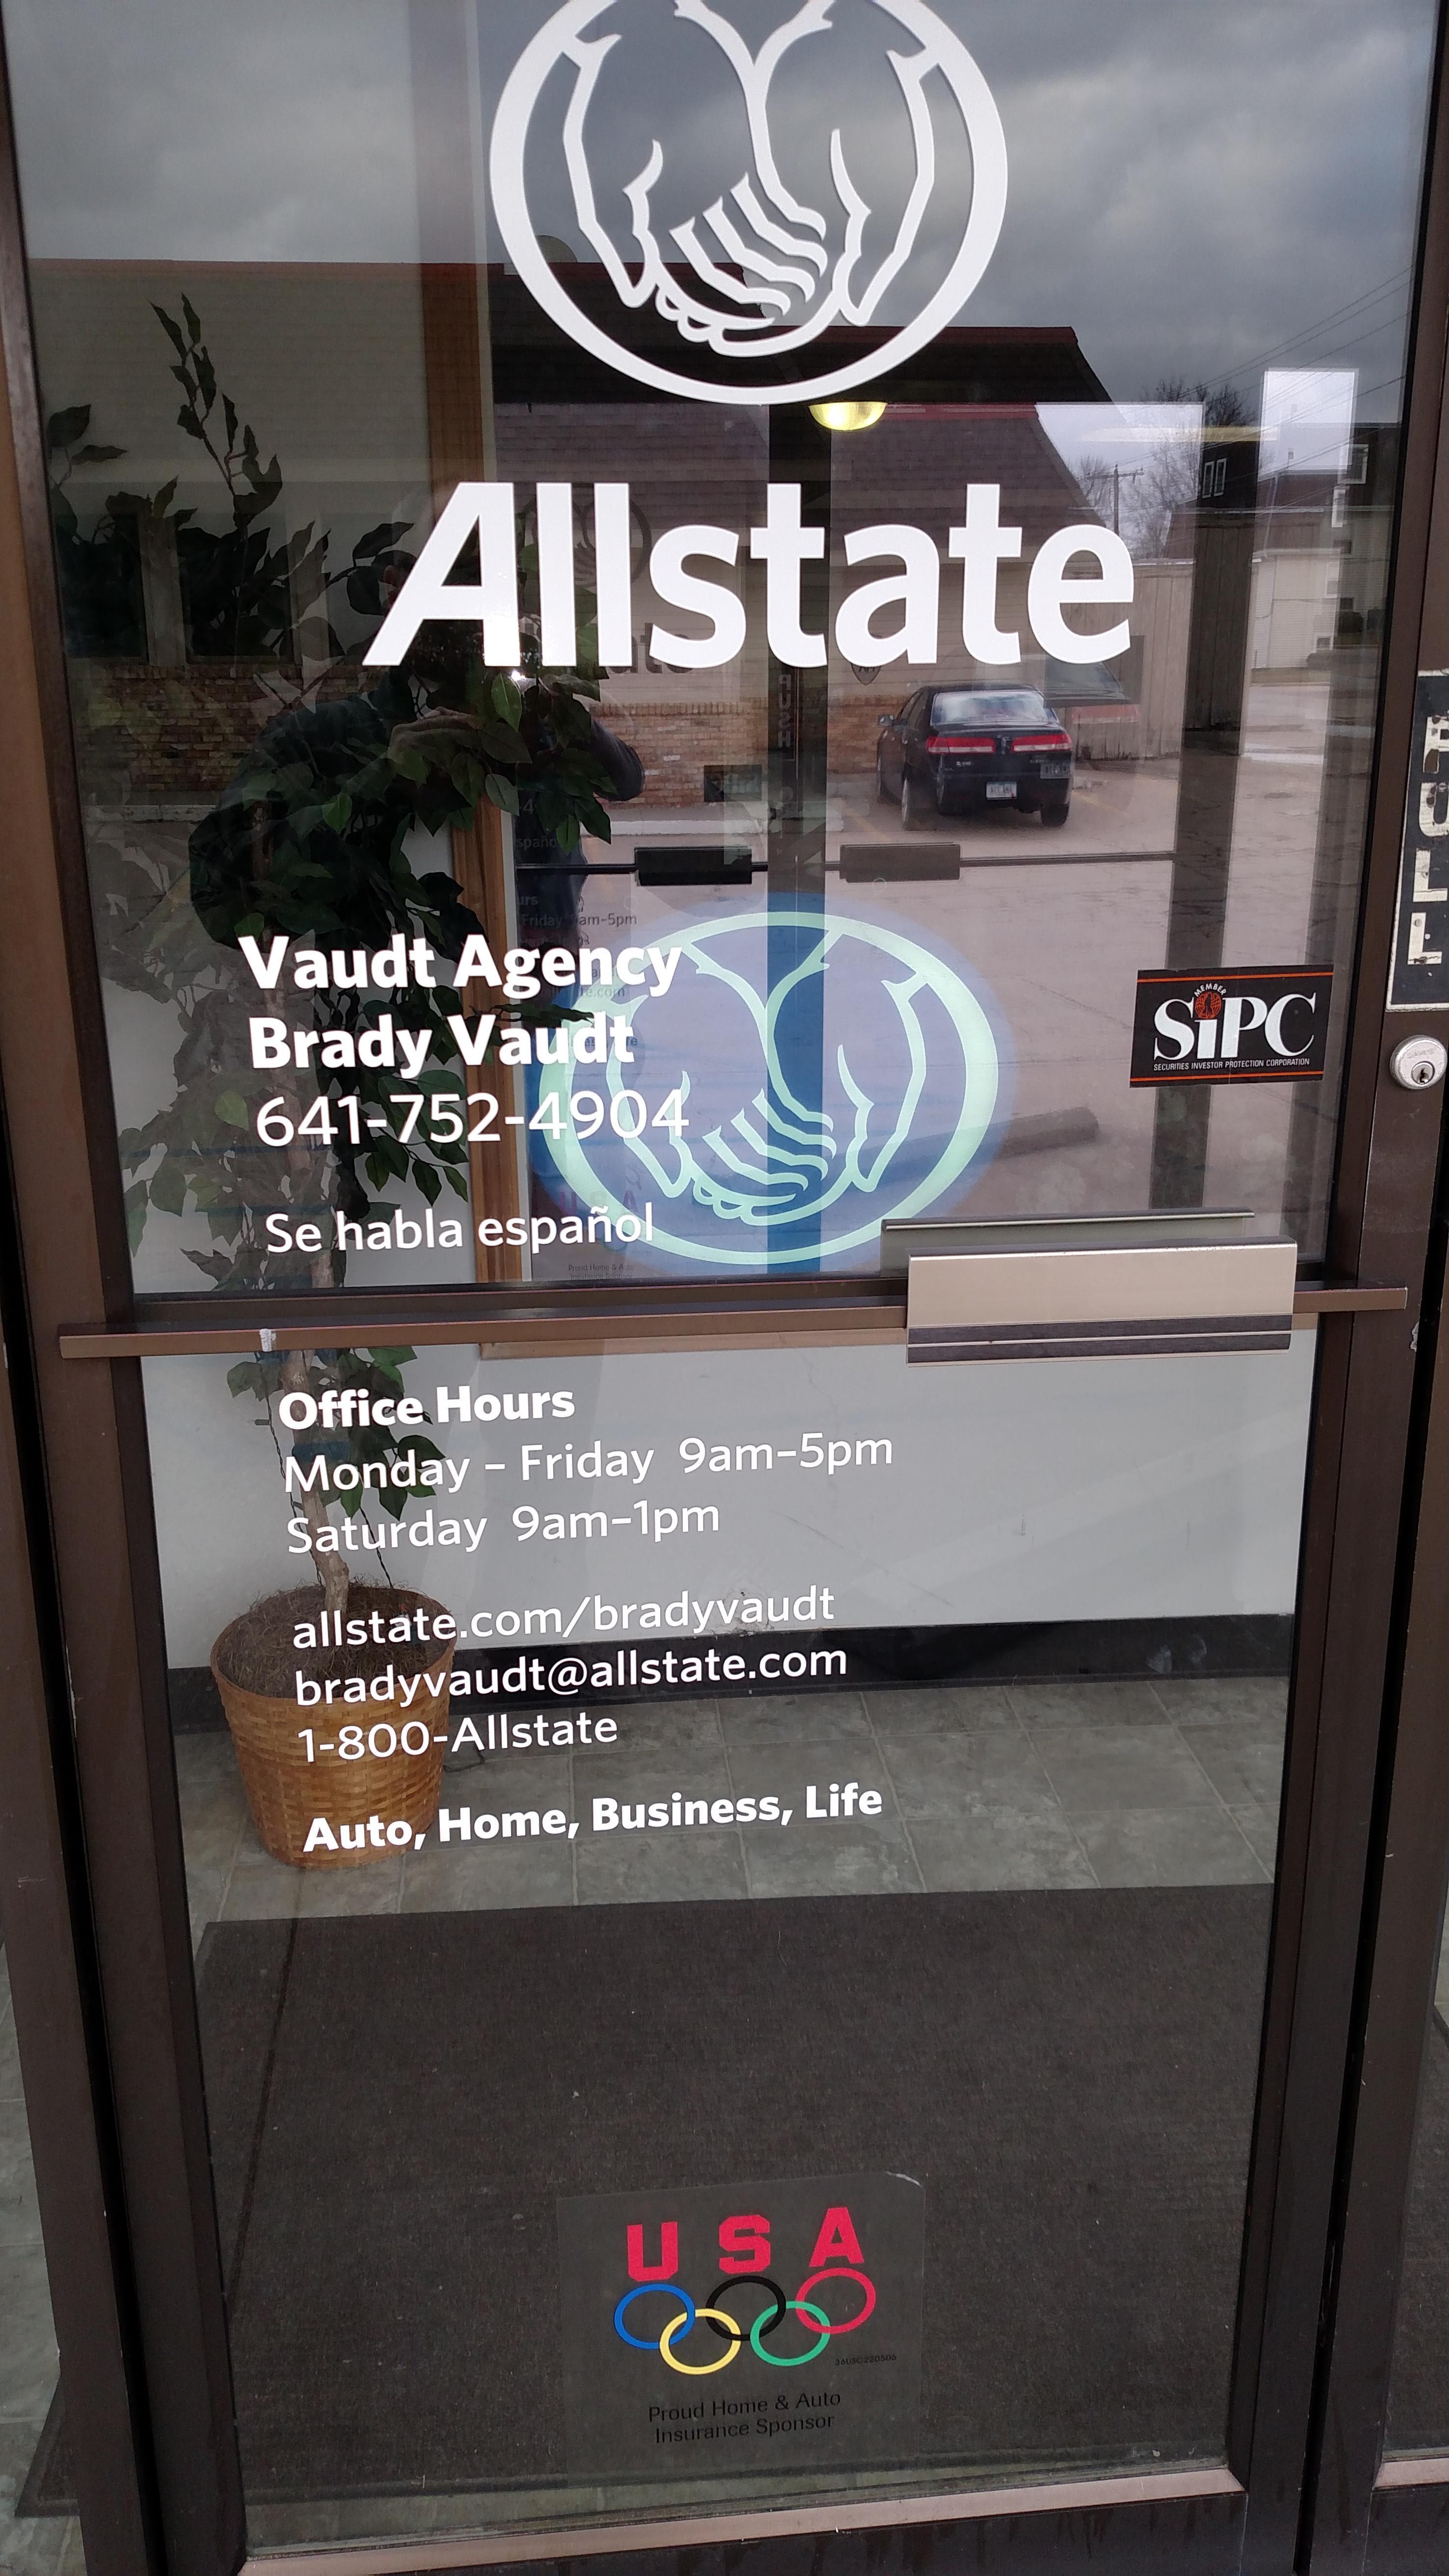 Brady Vaudt: Allstate Insurance image 1